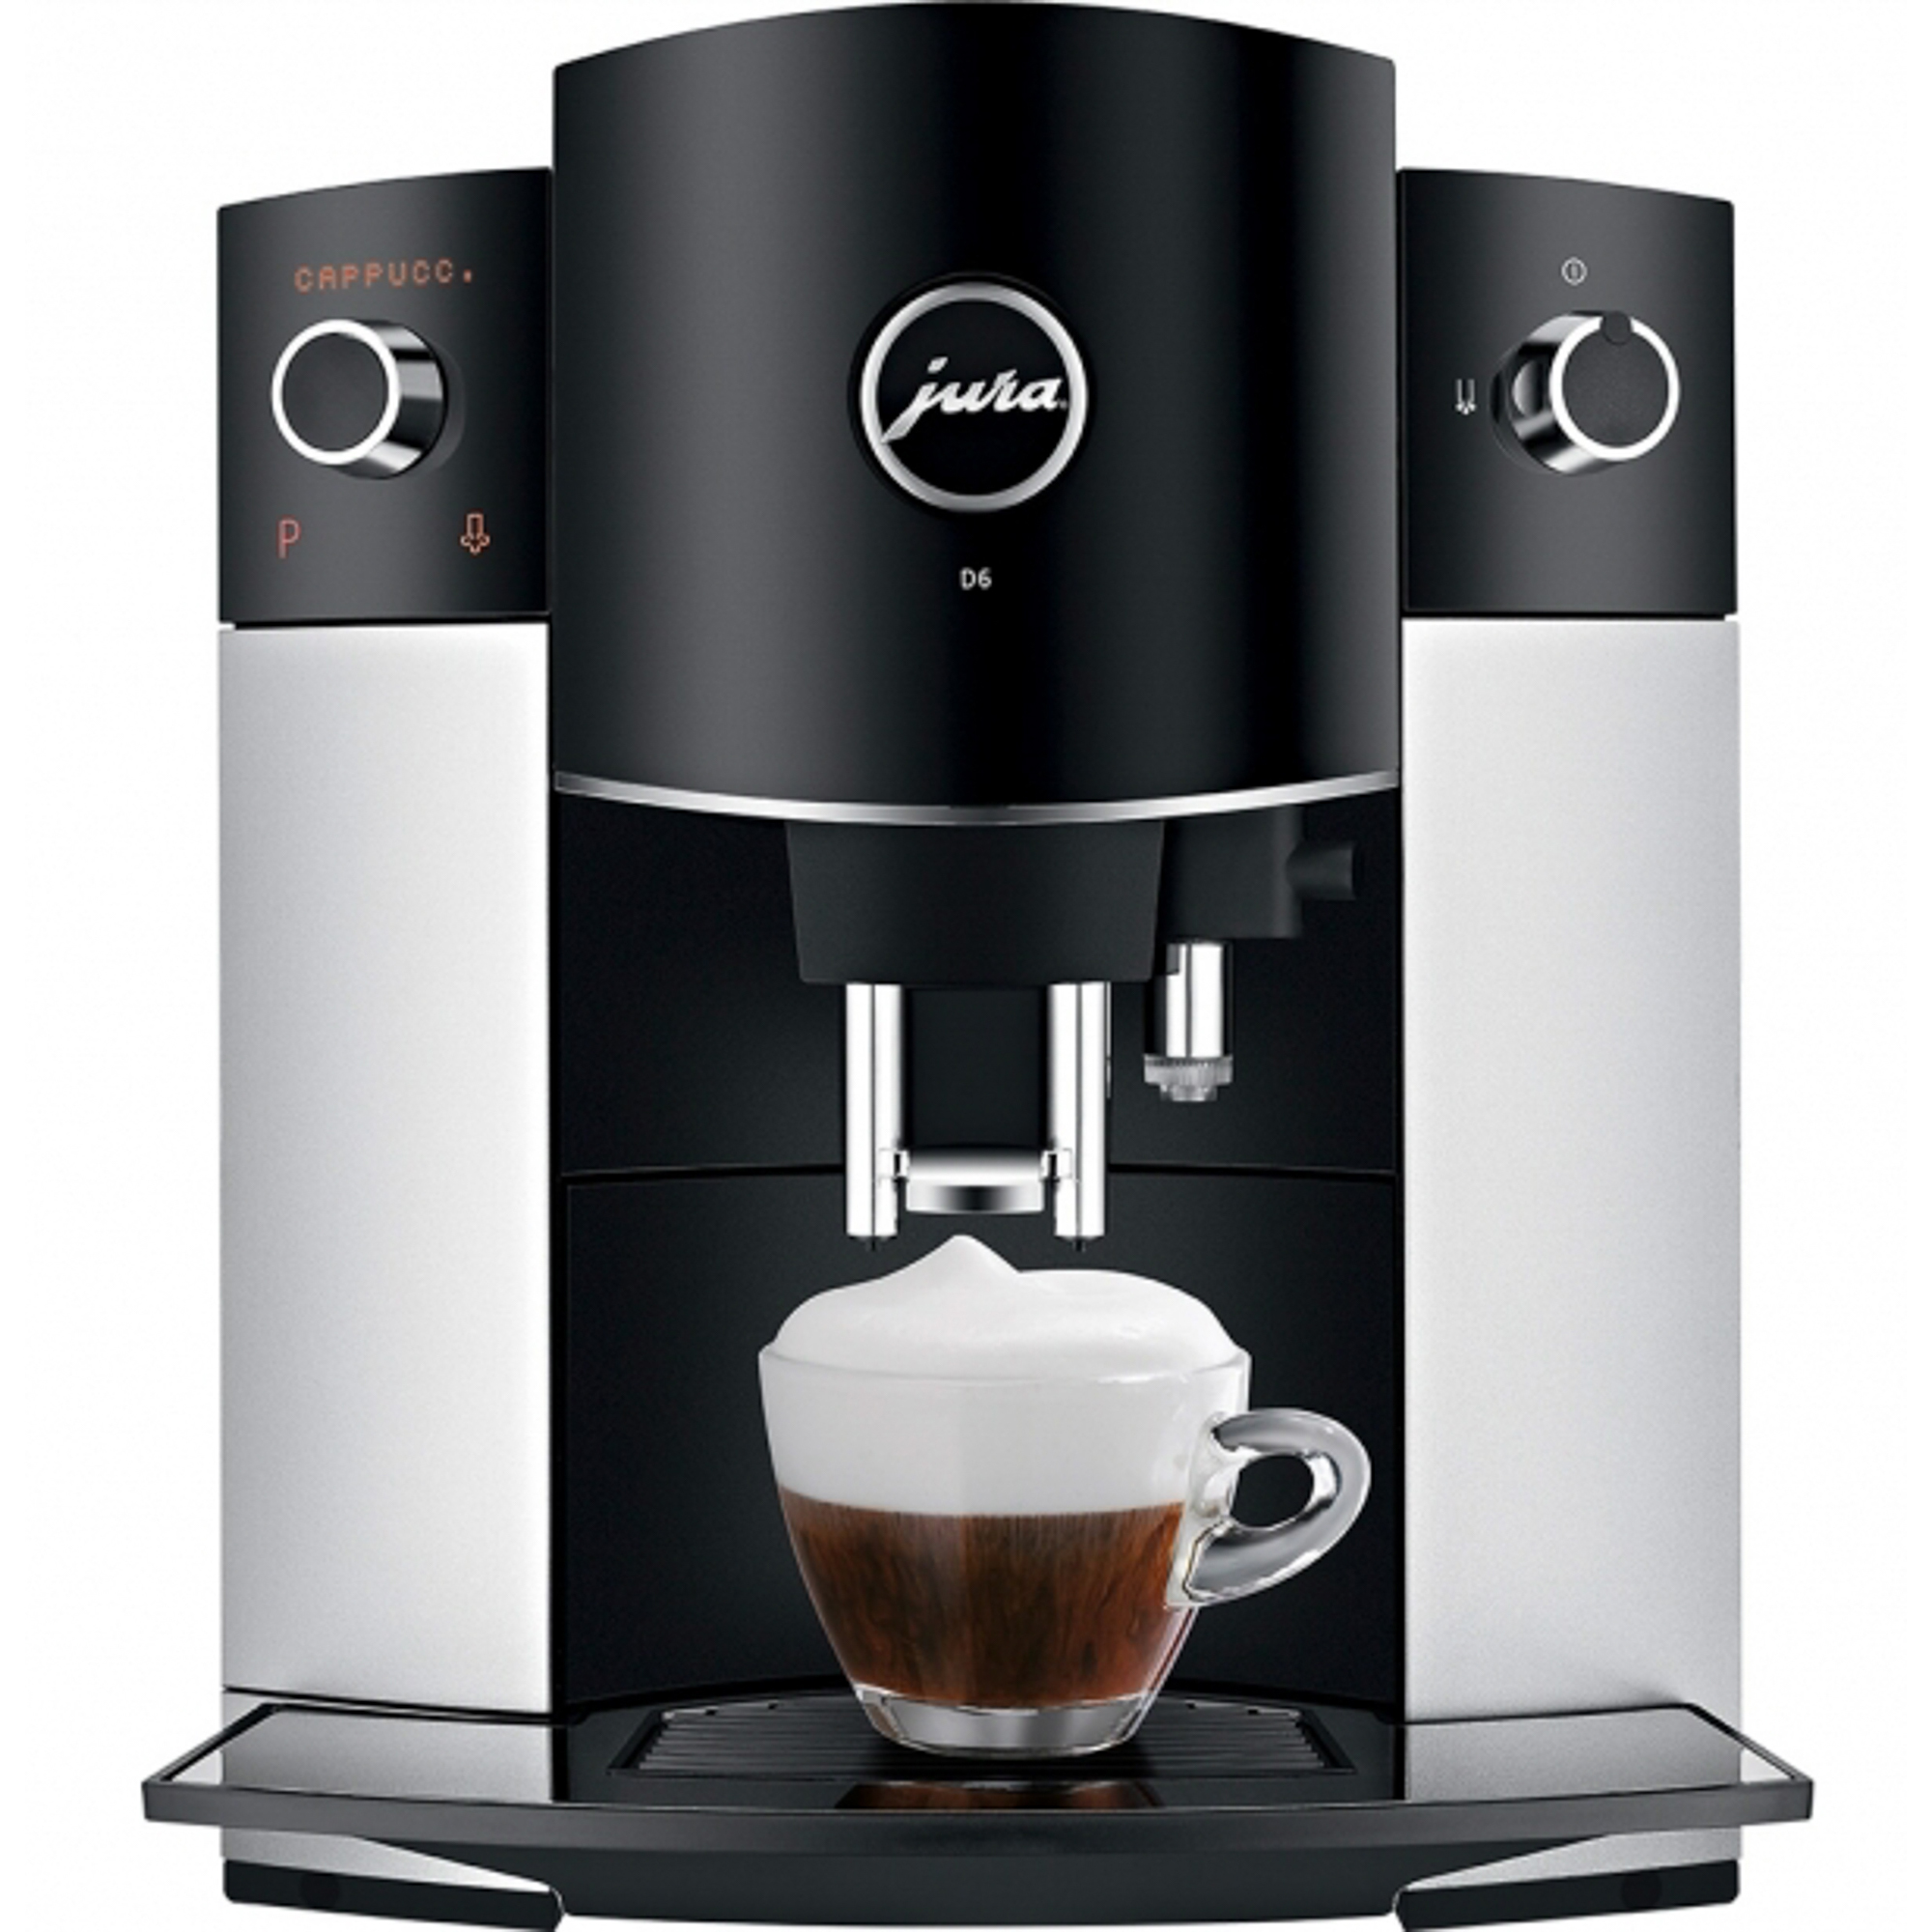 Кофемашина Jura D6 Platin EU 15181 кофемашина jura e6 platin 15058